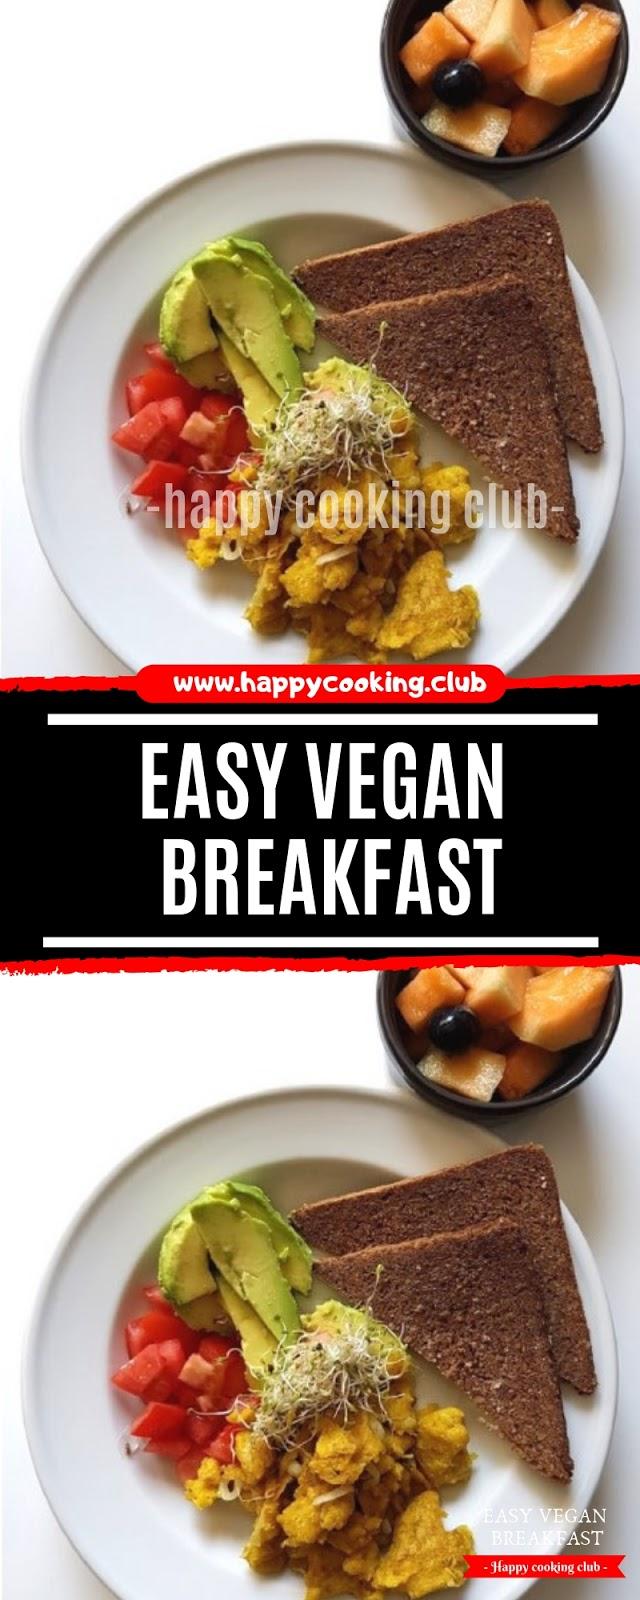 Easy Vegan Breakfast